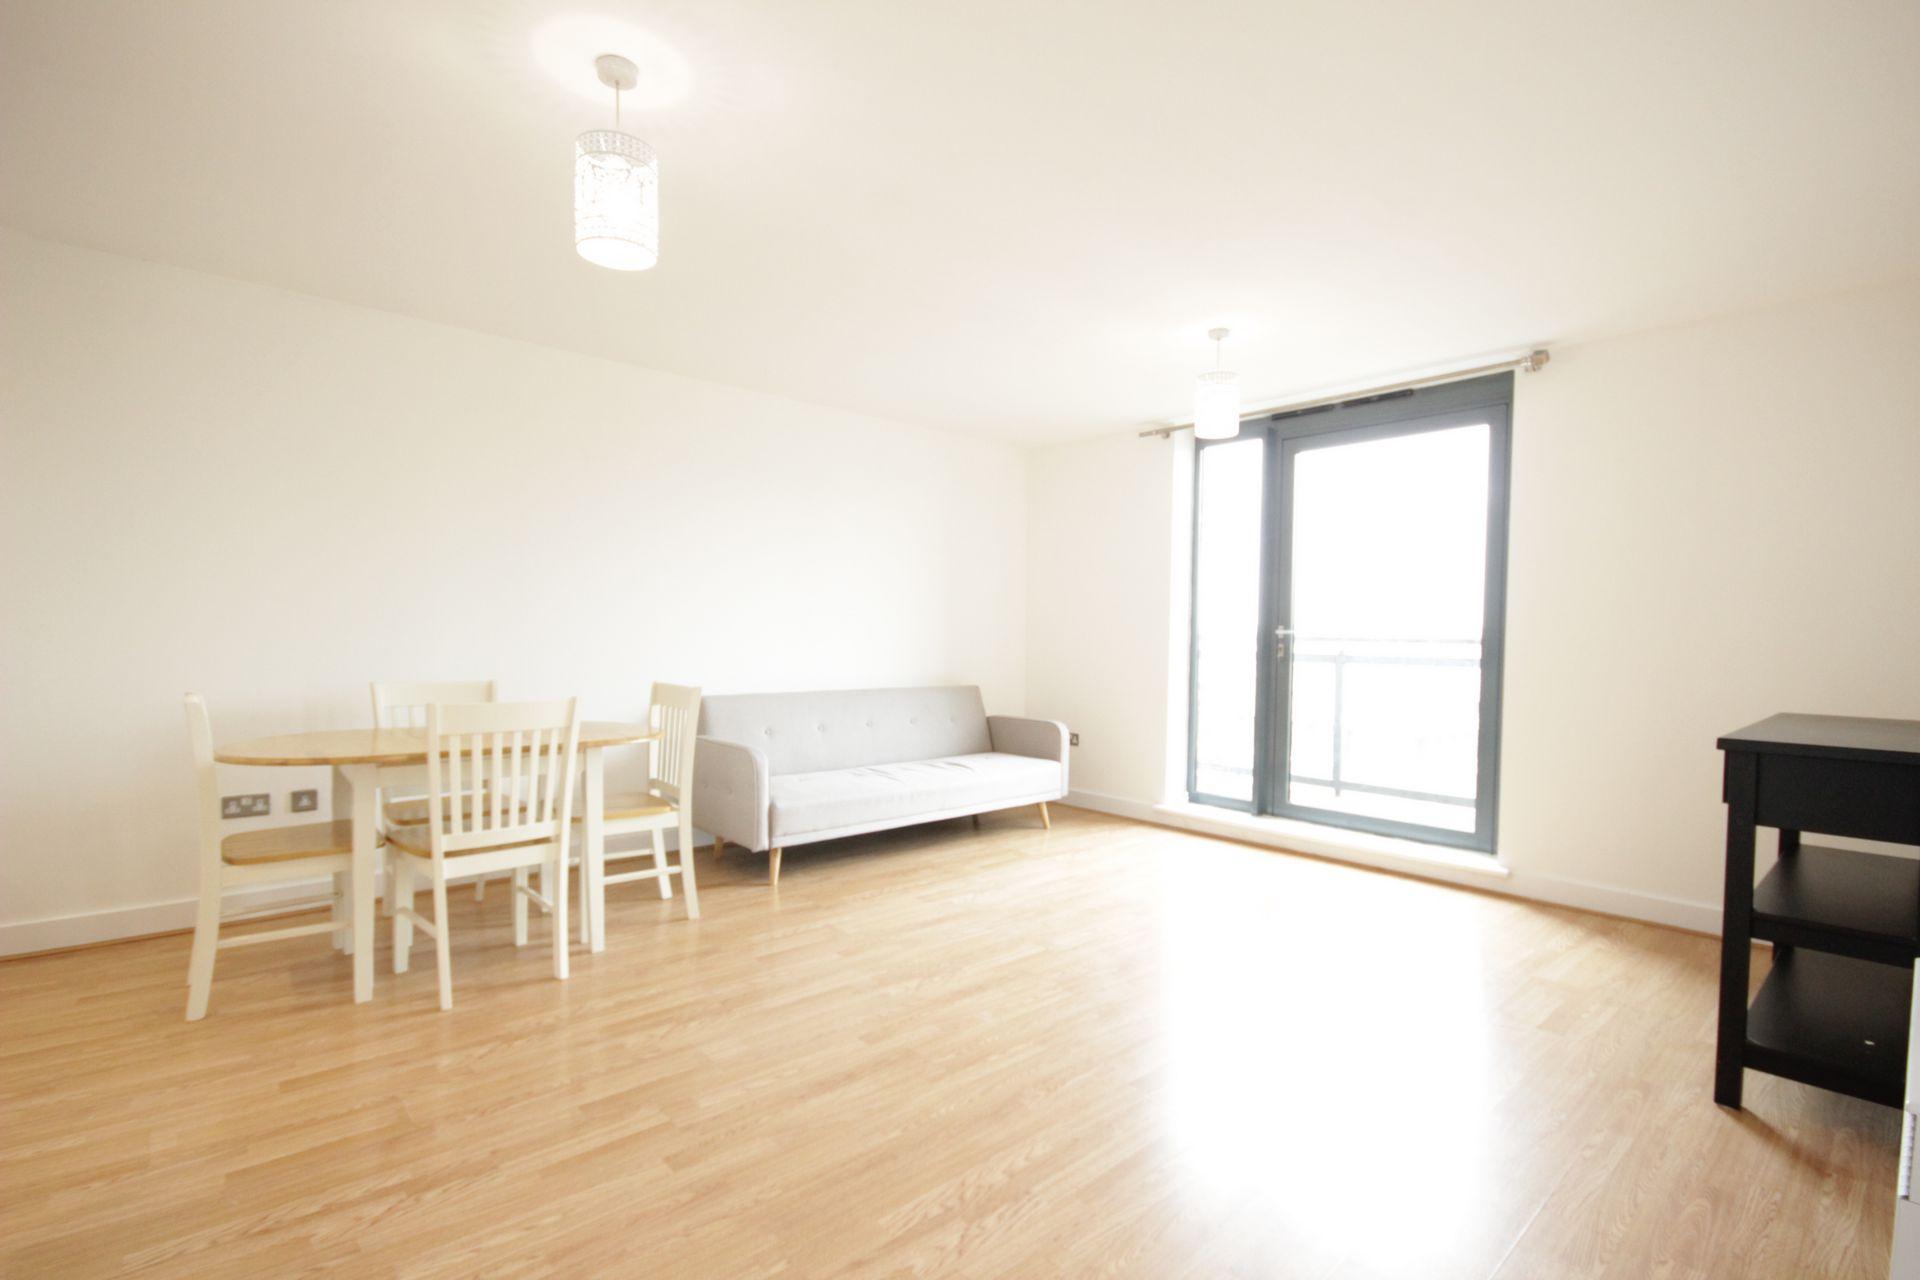 Eluna Apartments , Wapping Lane  London  E1W